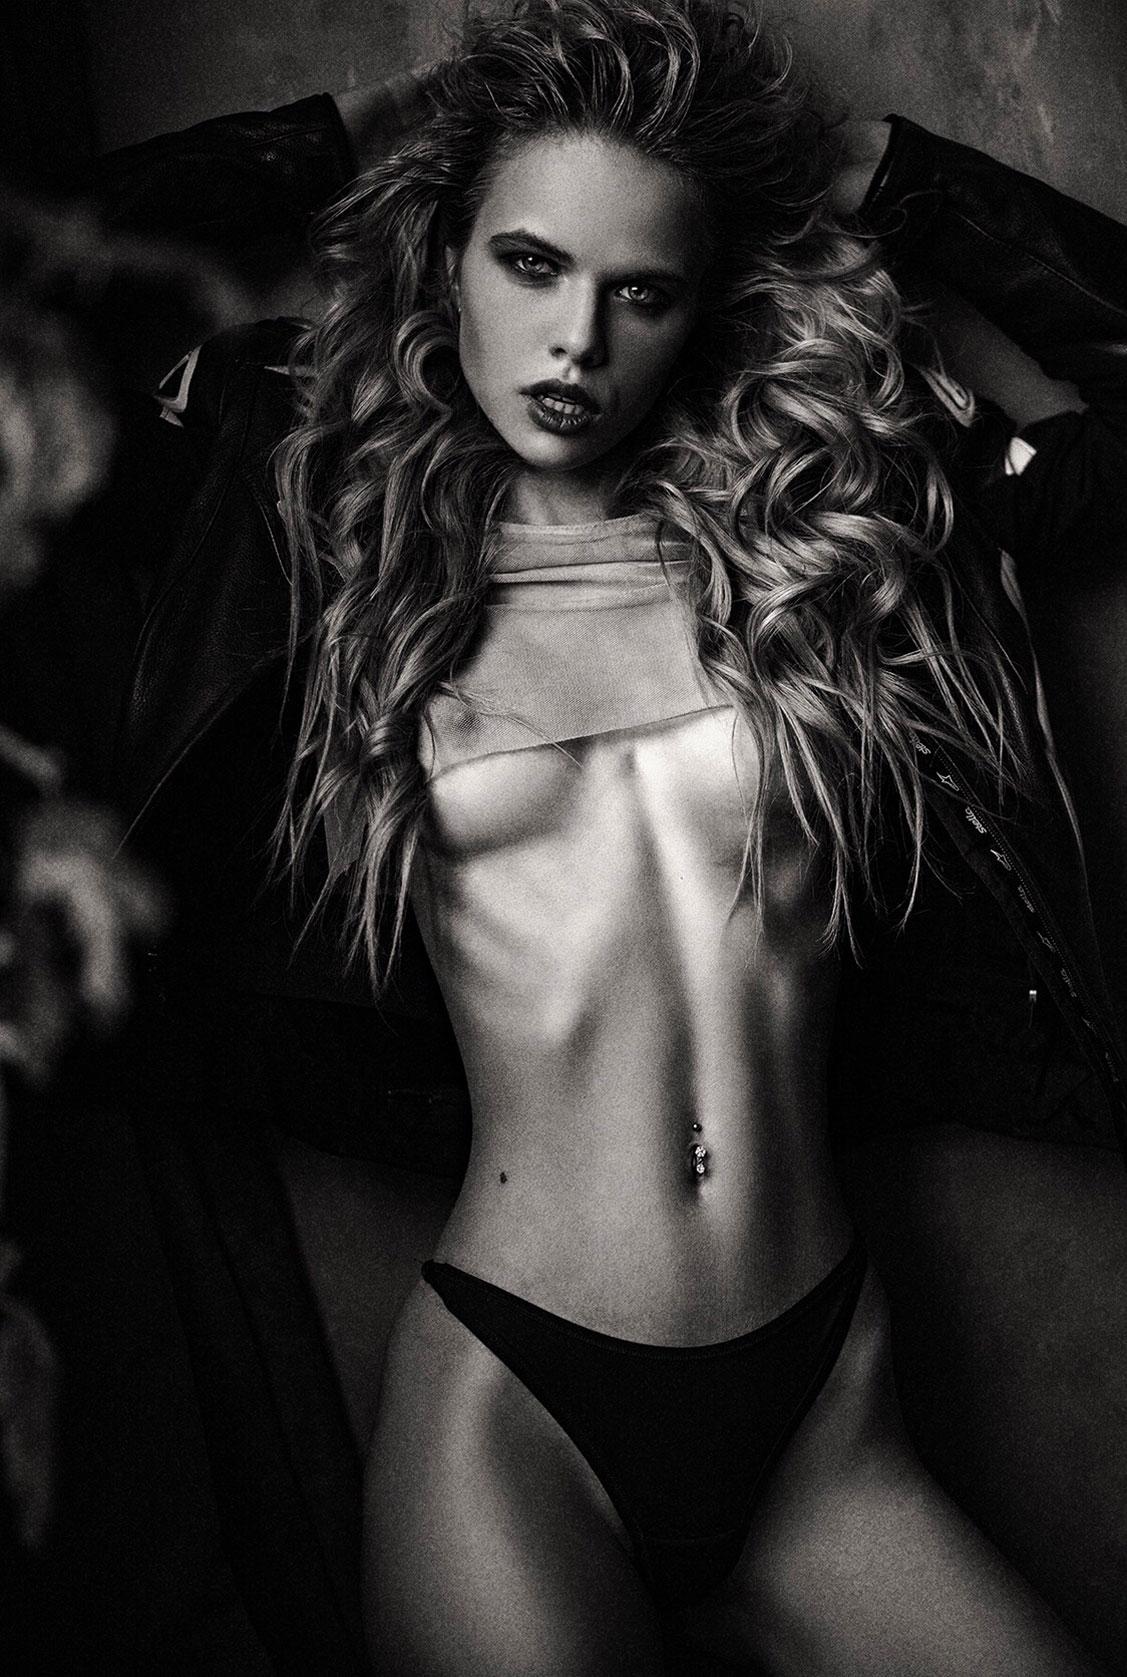 Александра Смелова, фотограф Алексей Трифонов / Alexandra Smelova nude by Alexey Trifonov